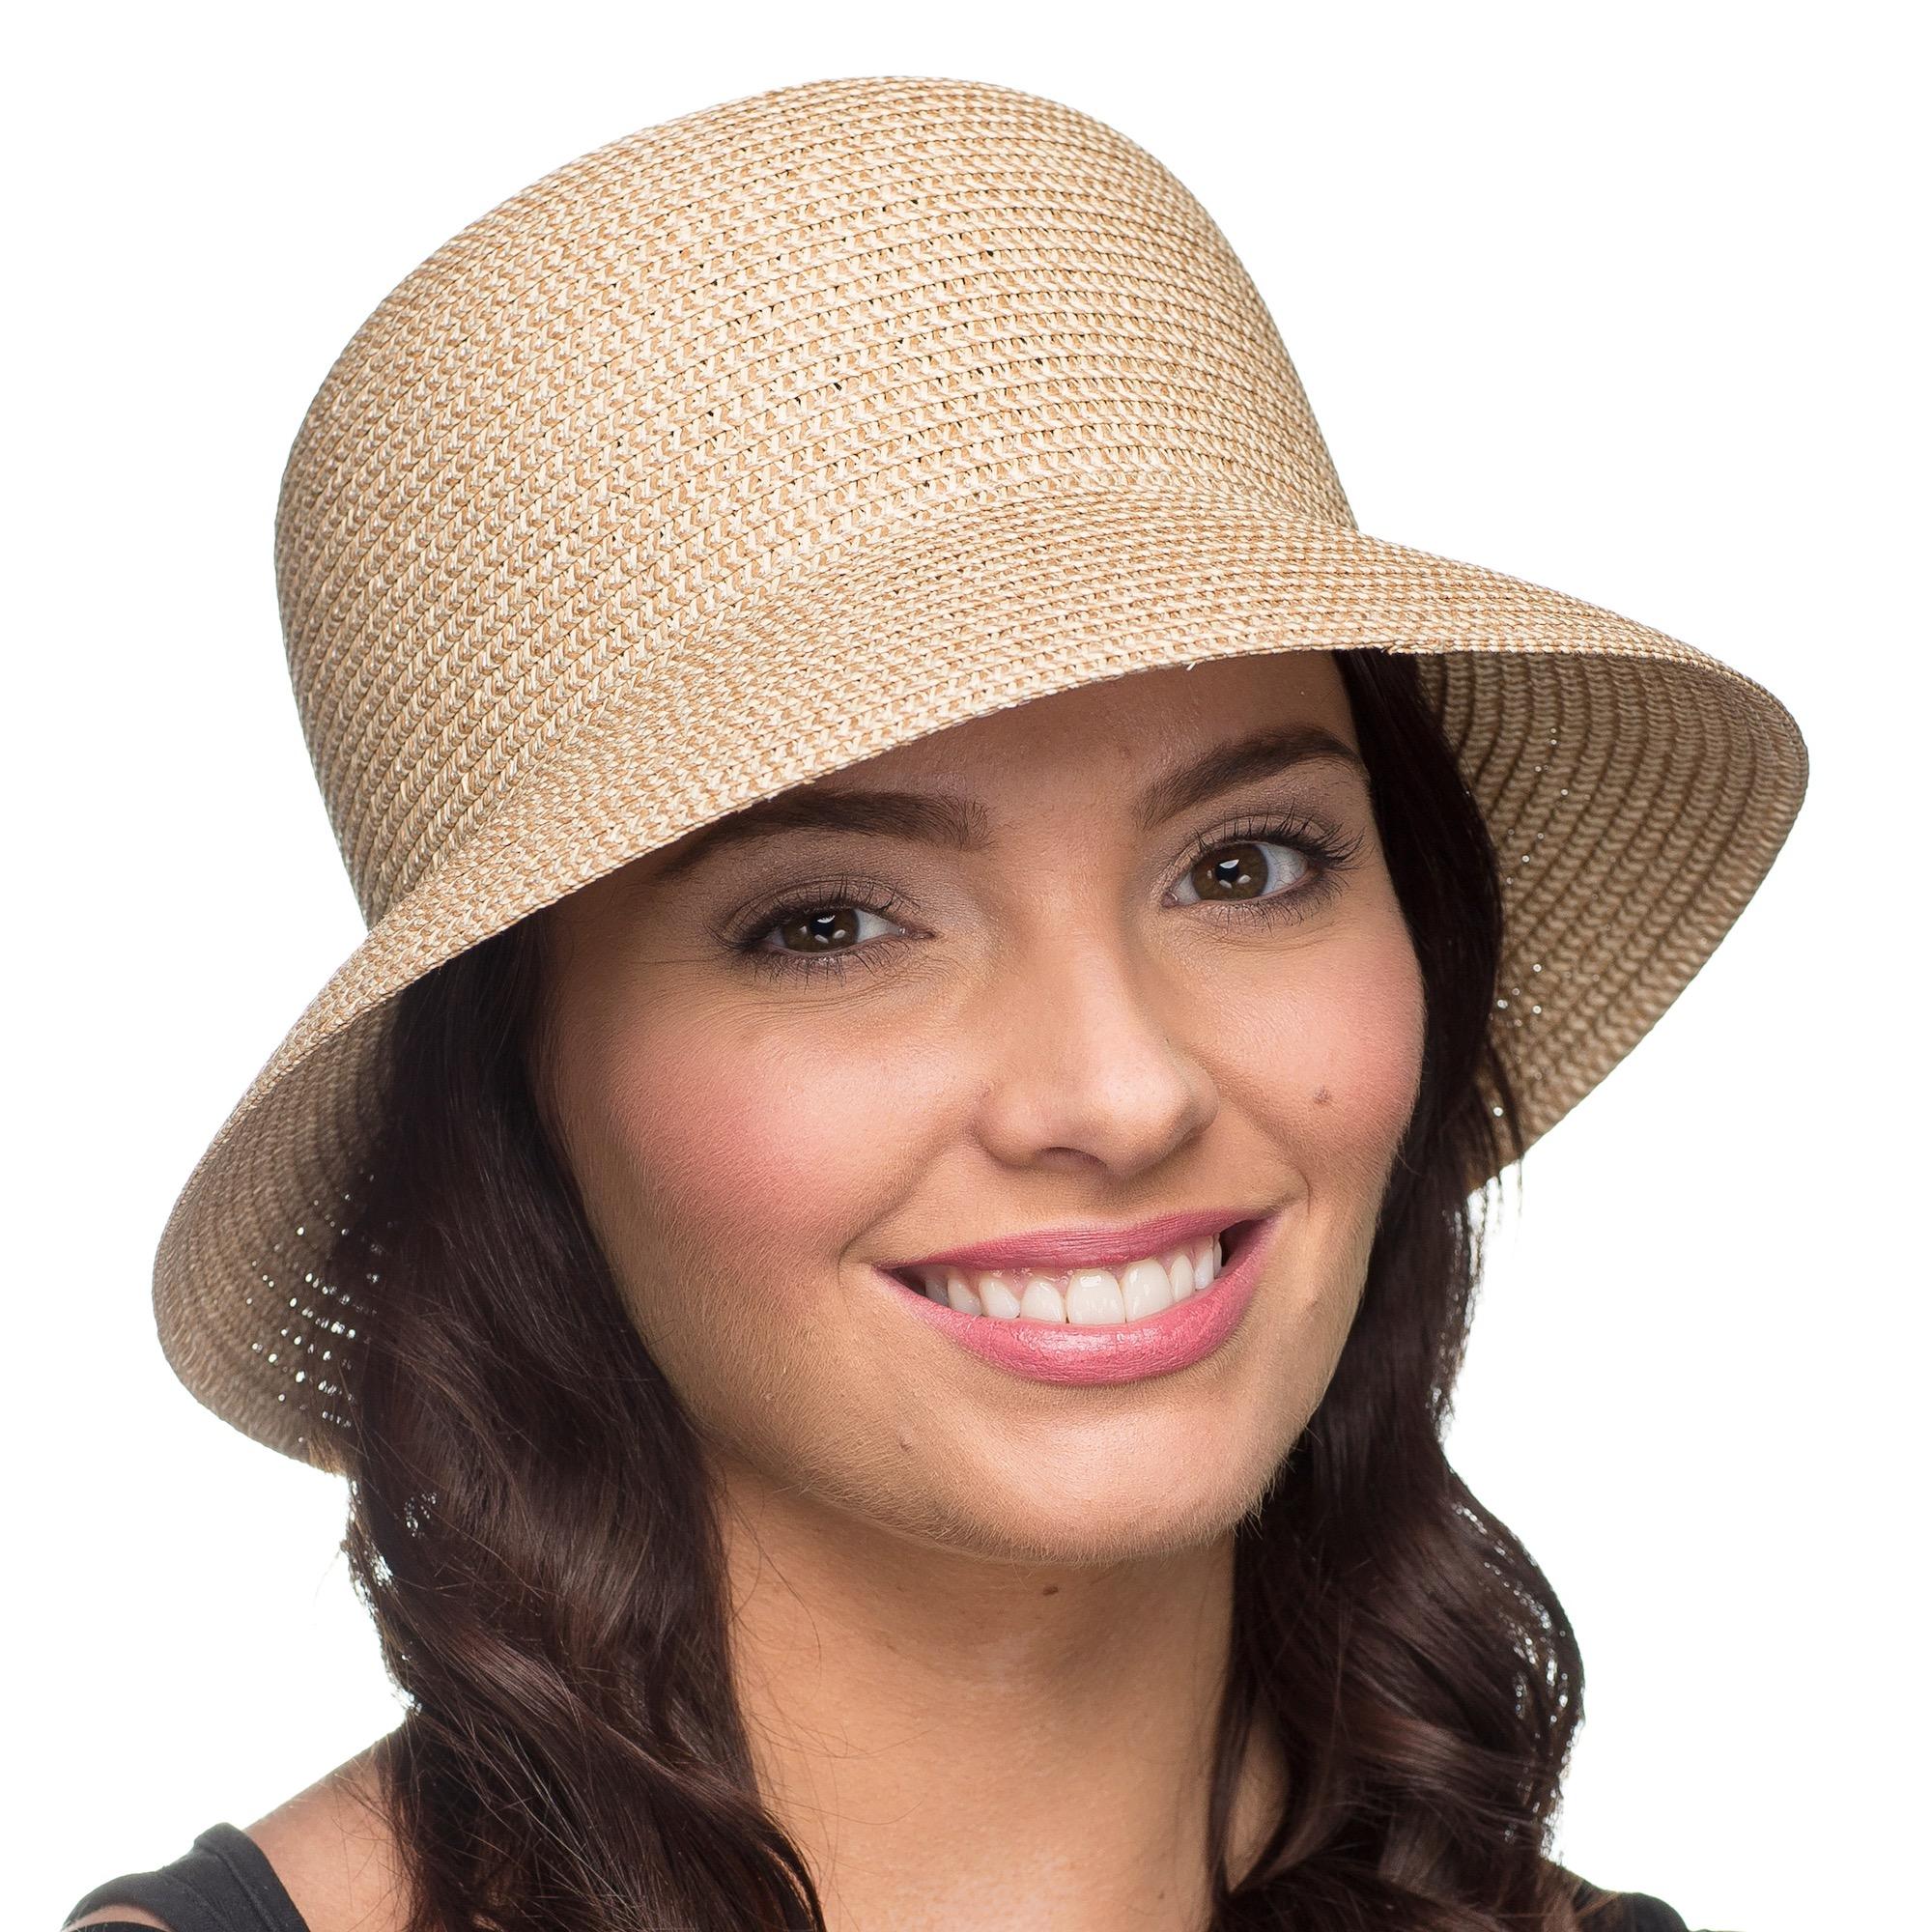 41d6c4d59ab Details about i-Smalls Women s Summer Lightweight Wide Brim Cloche Sun Hat  (One Size) Natural